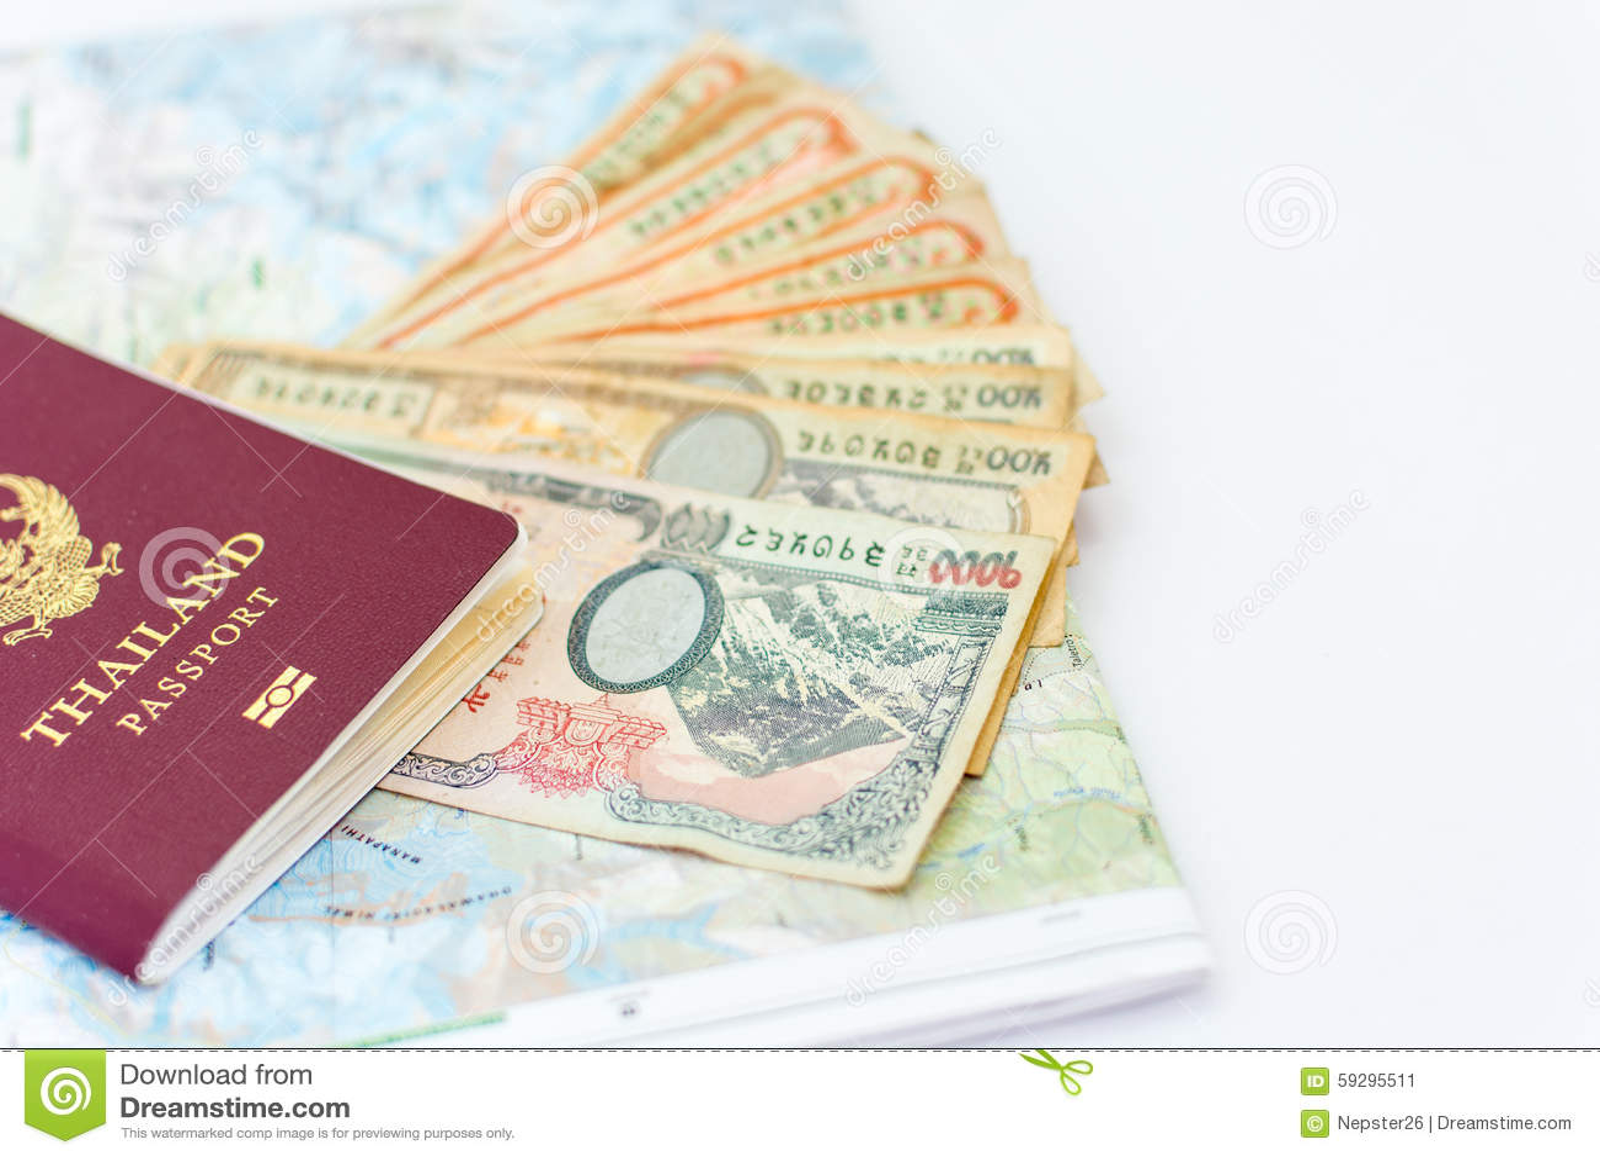 Thailand passport for tourism with Annapurna Region Nepal map a